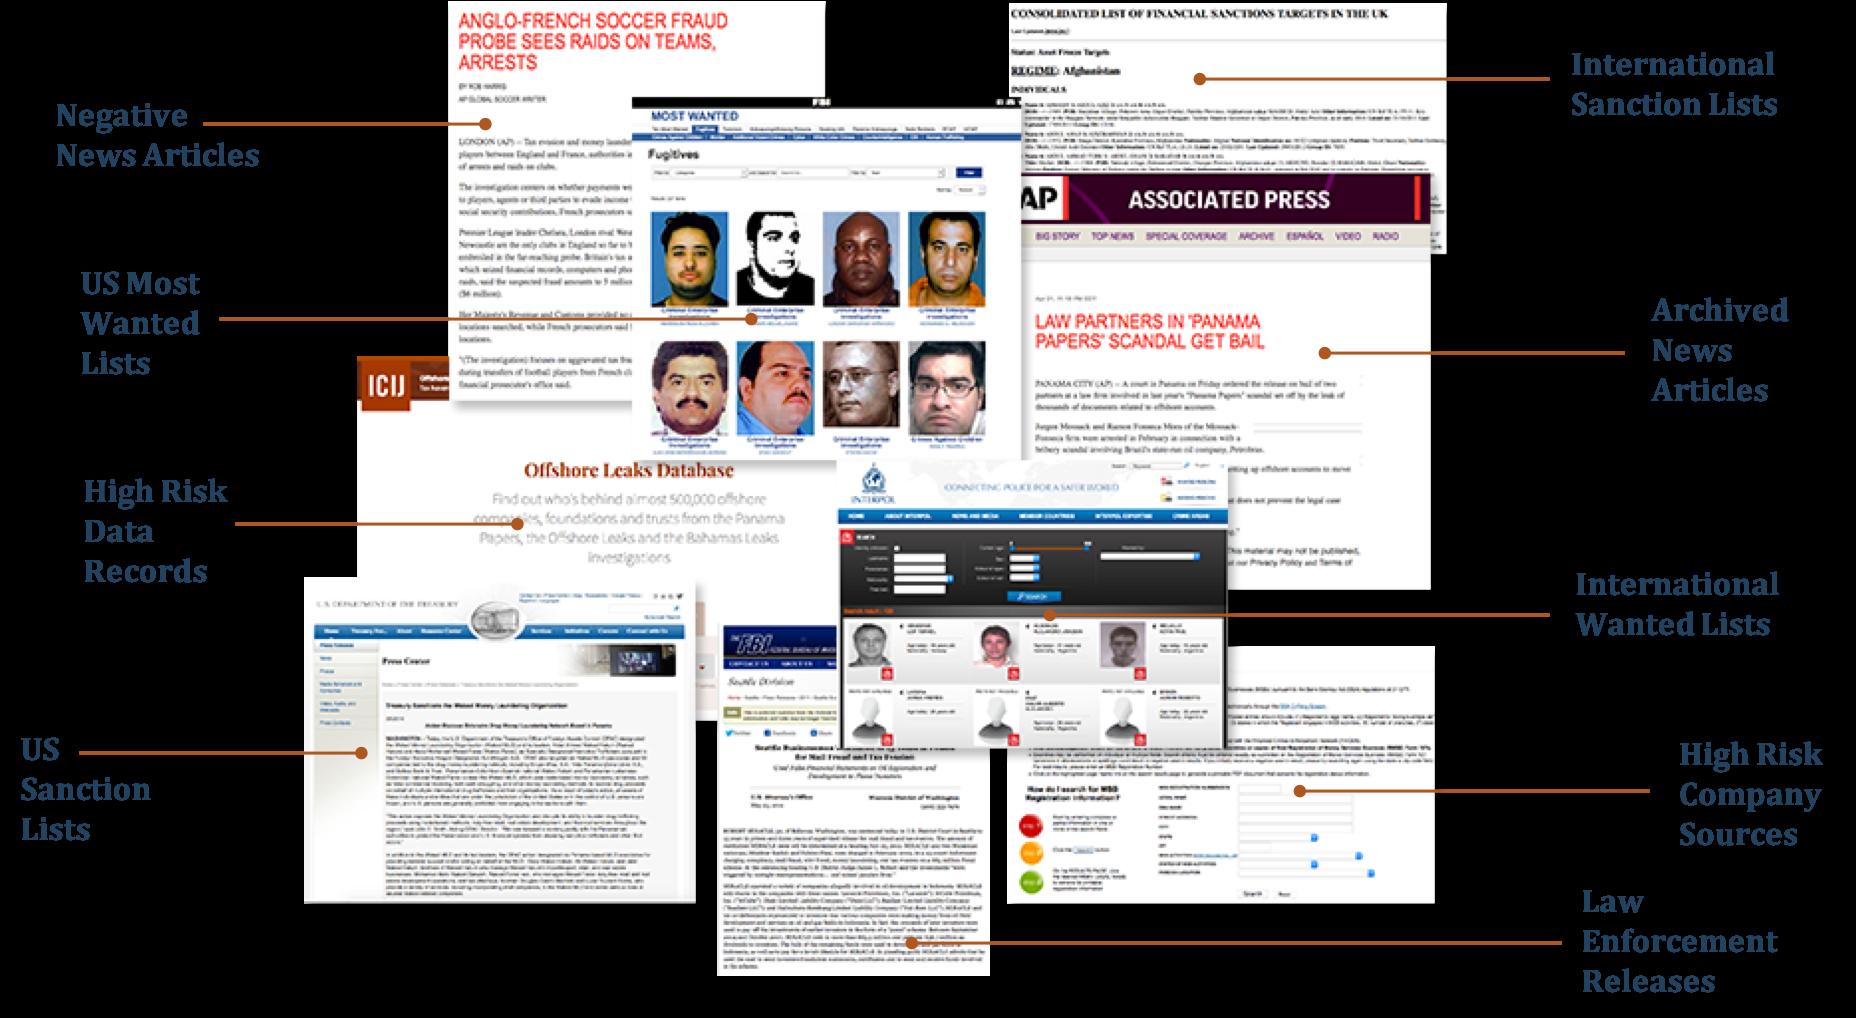 TransparINT_Data_Sources